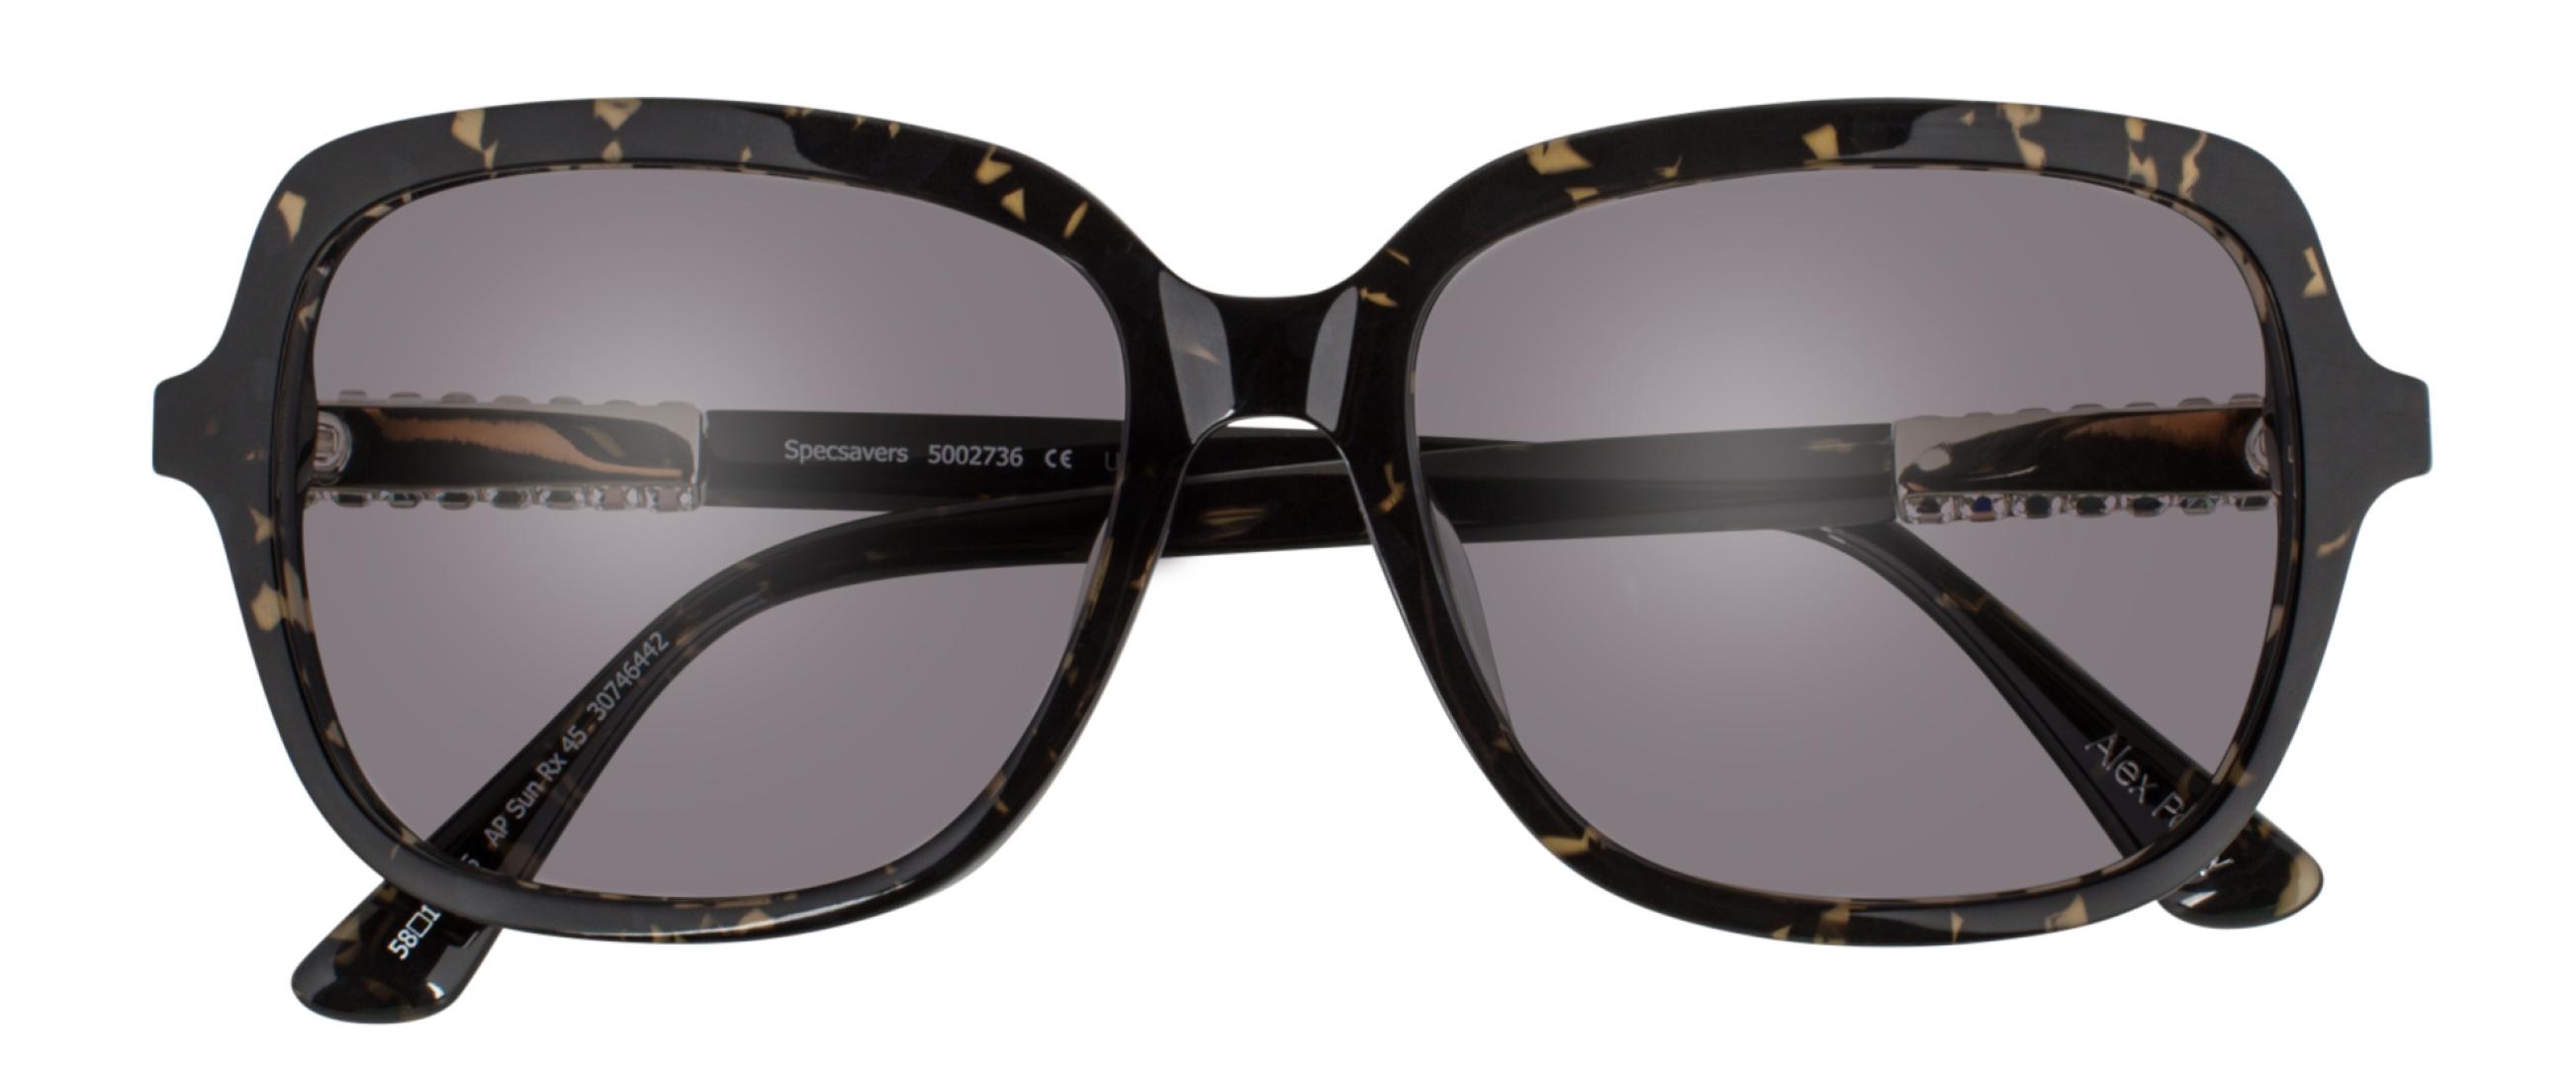 1d868ac1680f Alex Perry Eyewear –  LoveGlasses